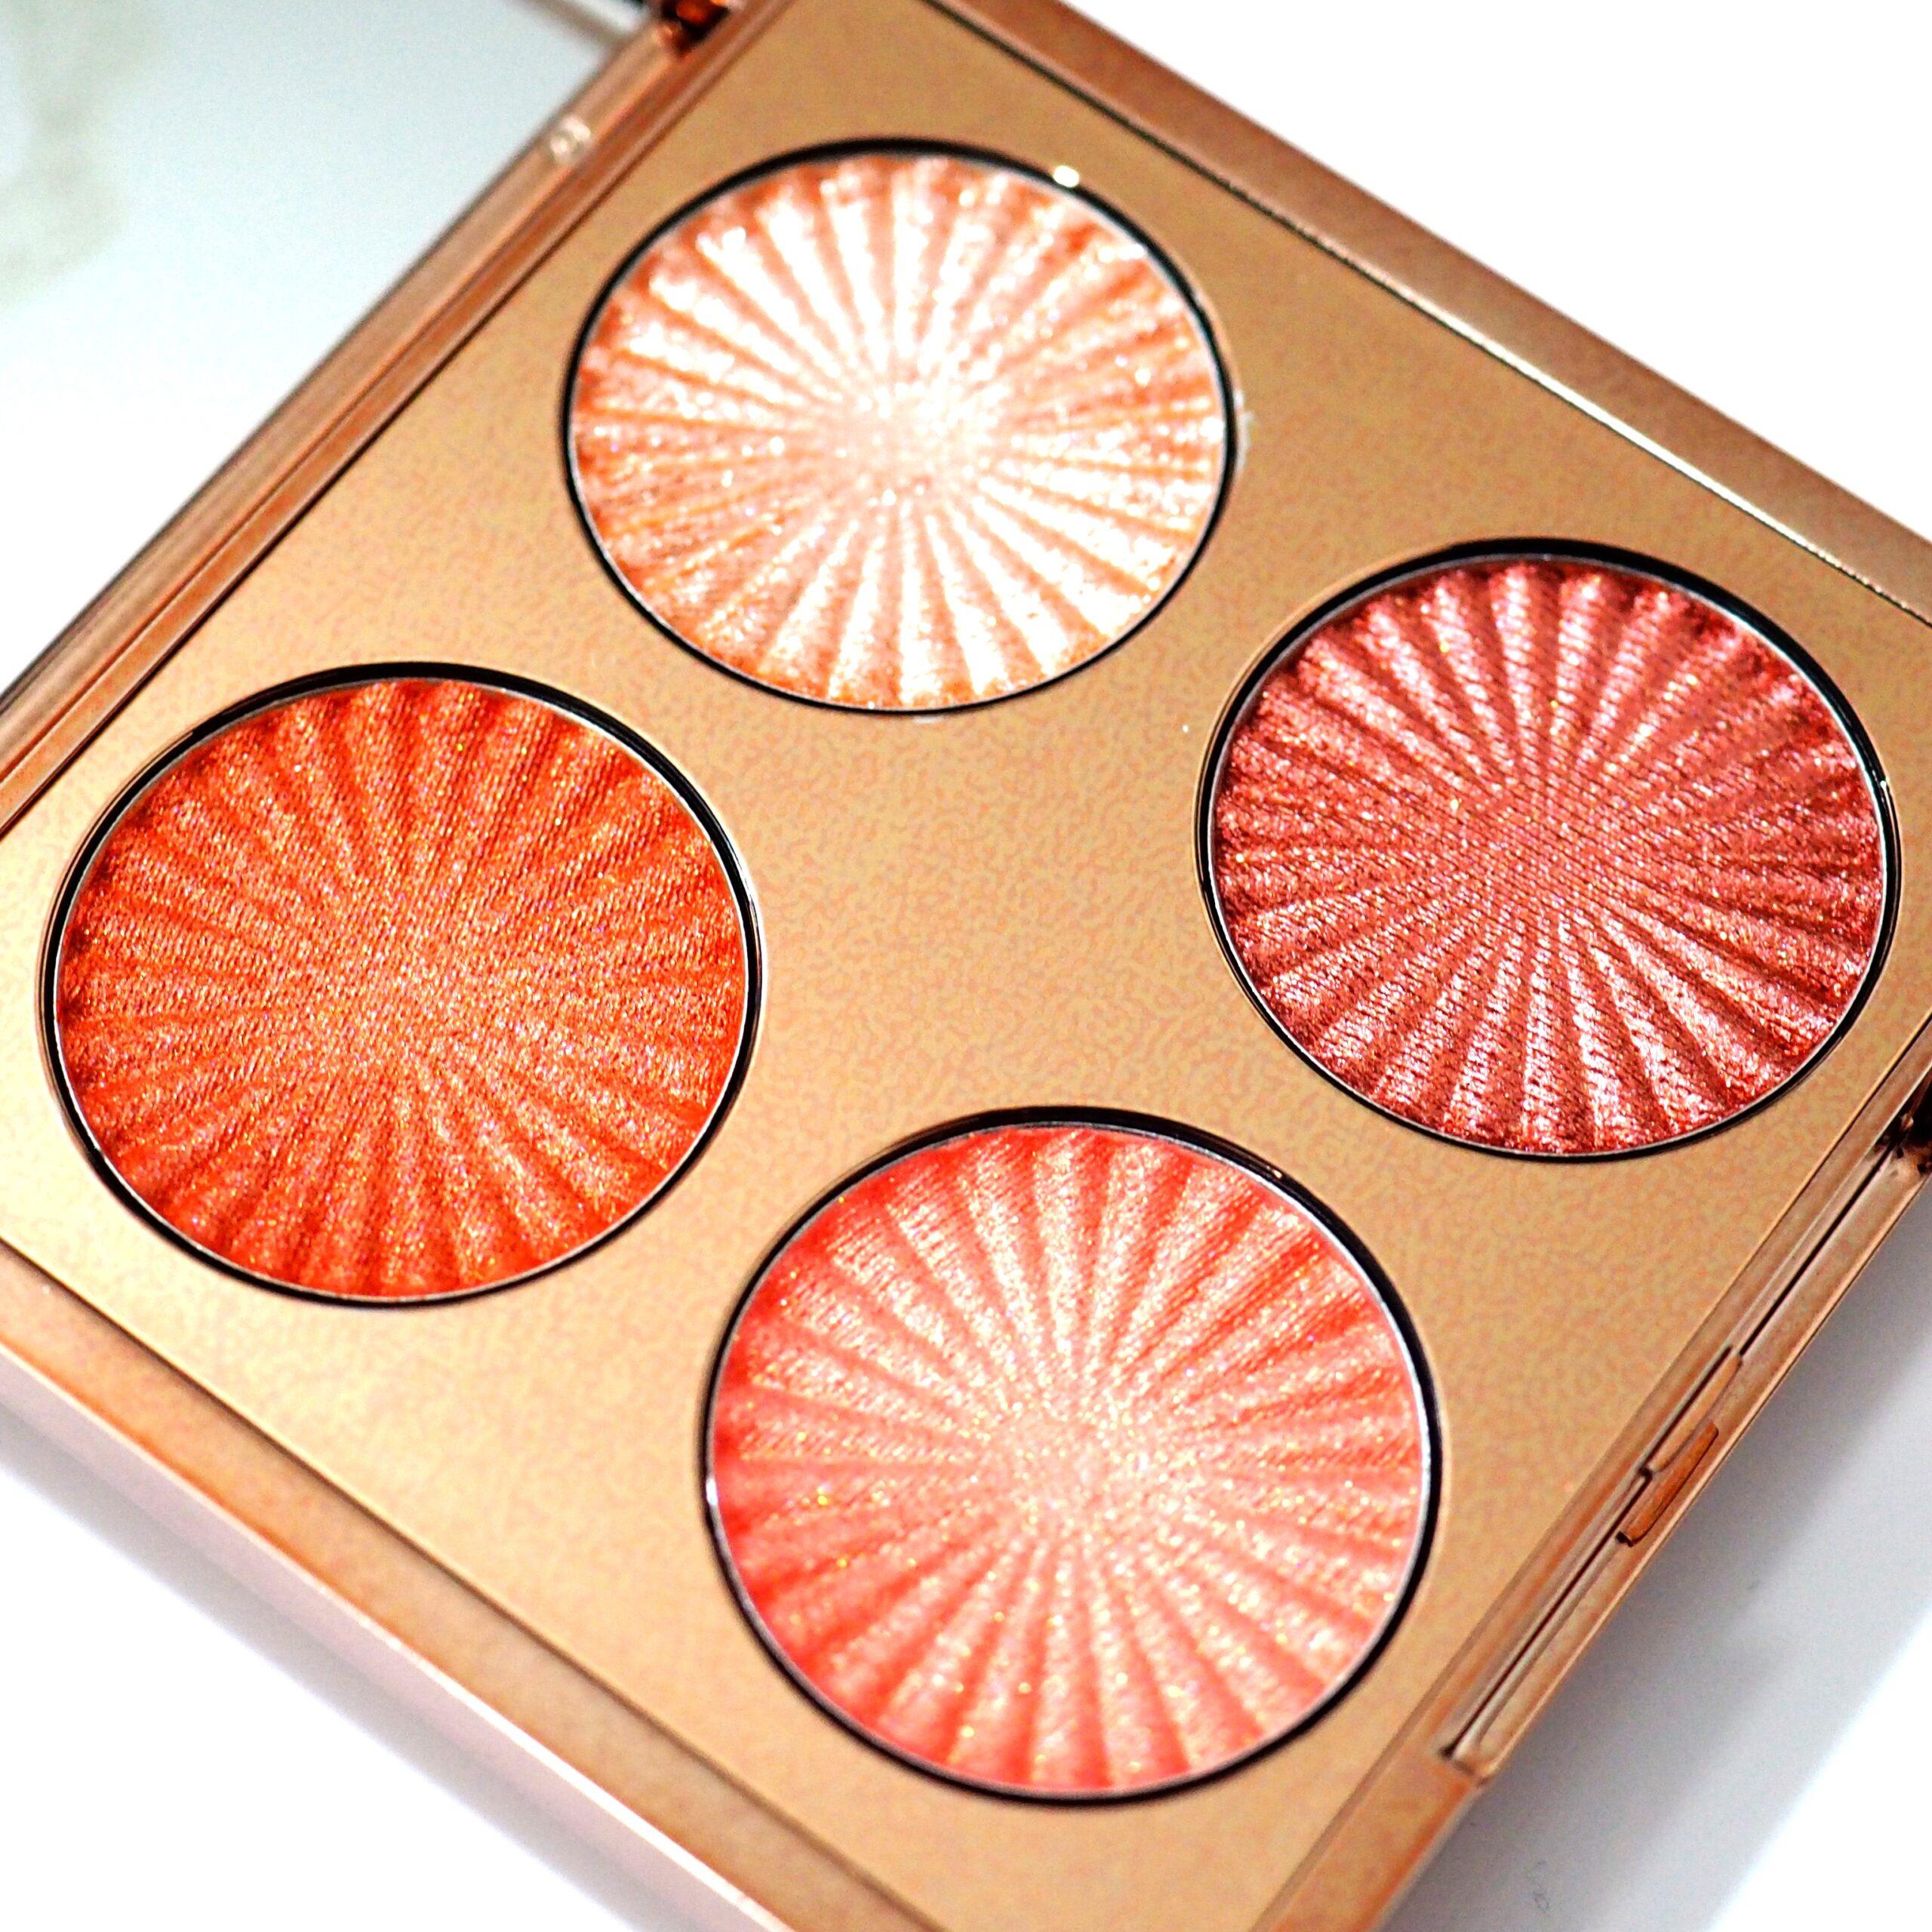 Revolution Pro Goddess Glow Eye Quads Review / Swatches